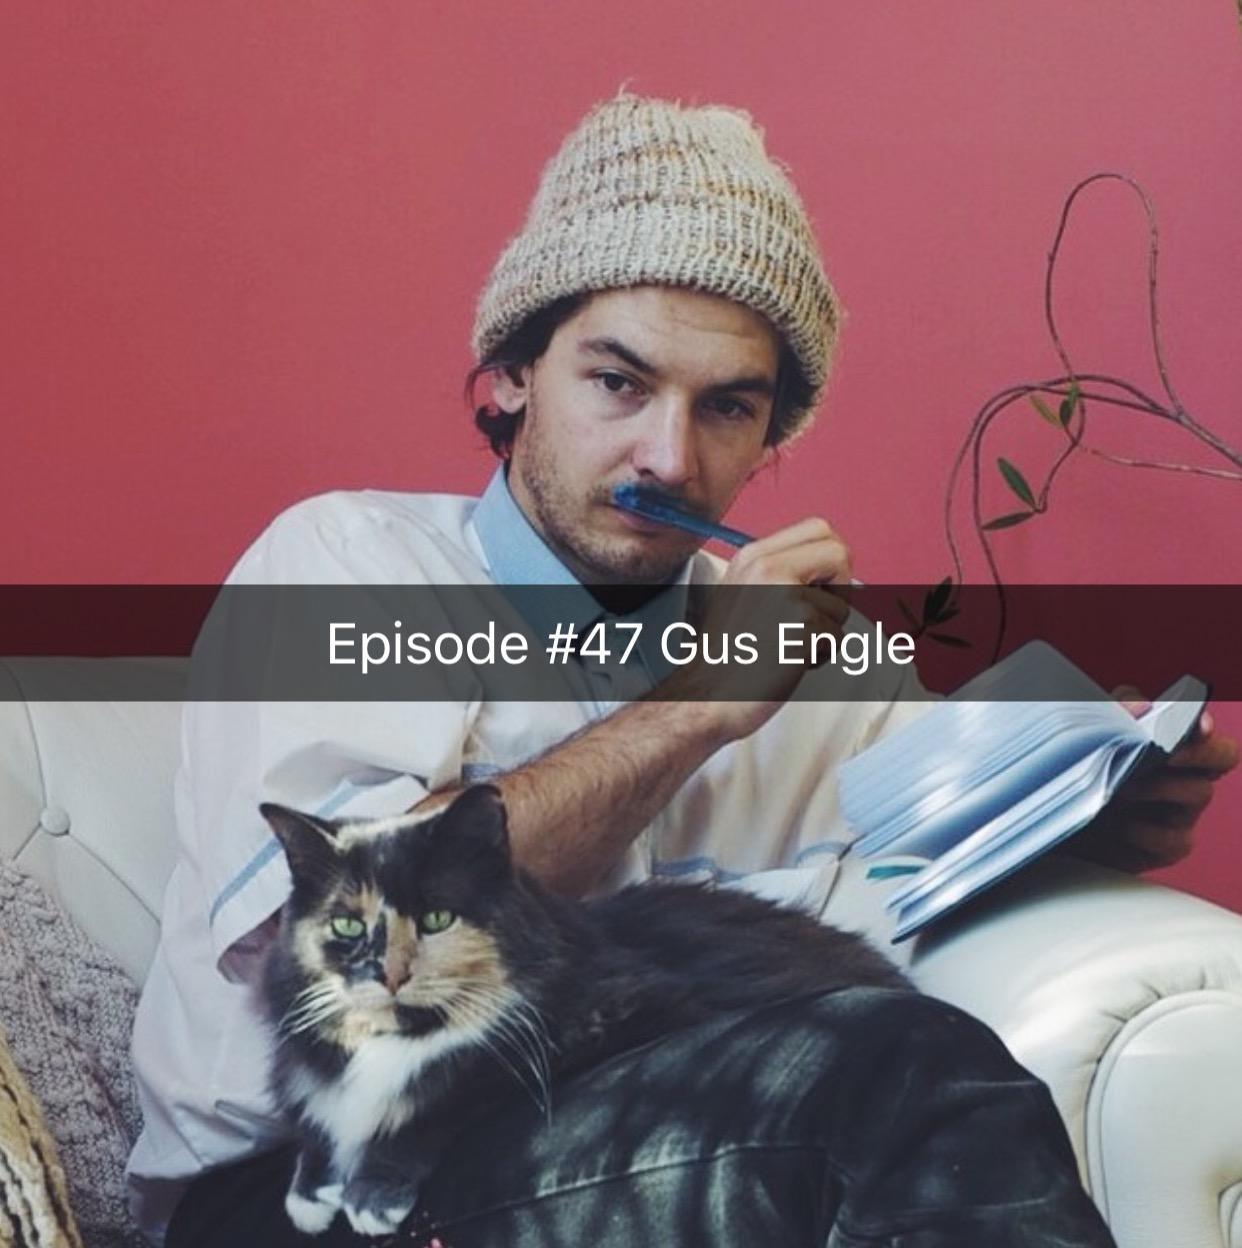 Gus Engle | Van Life | Hawaii | Music | Introspection | Dostoyevsky | Just For Men